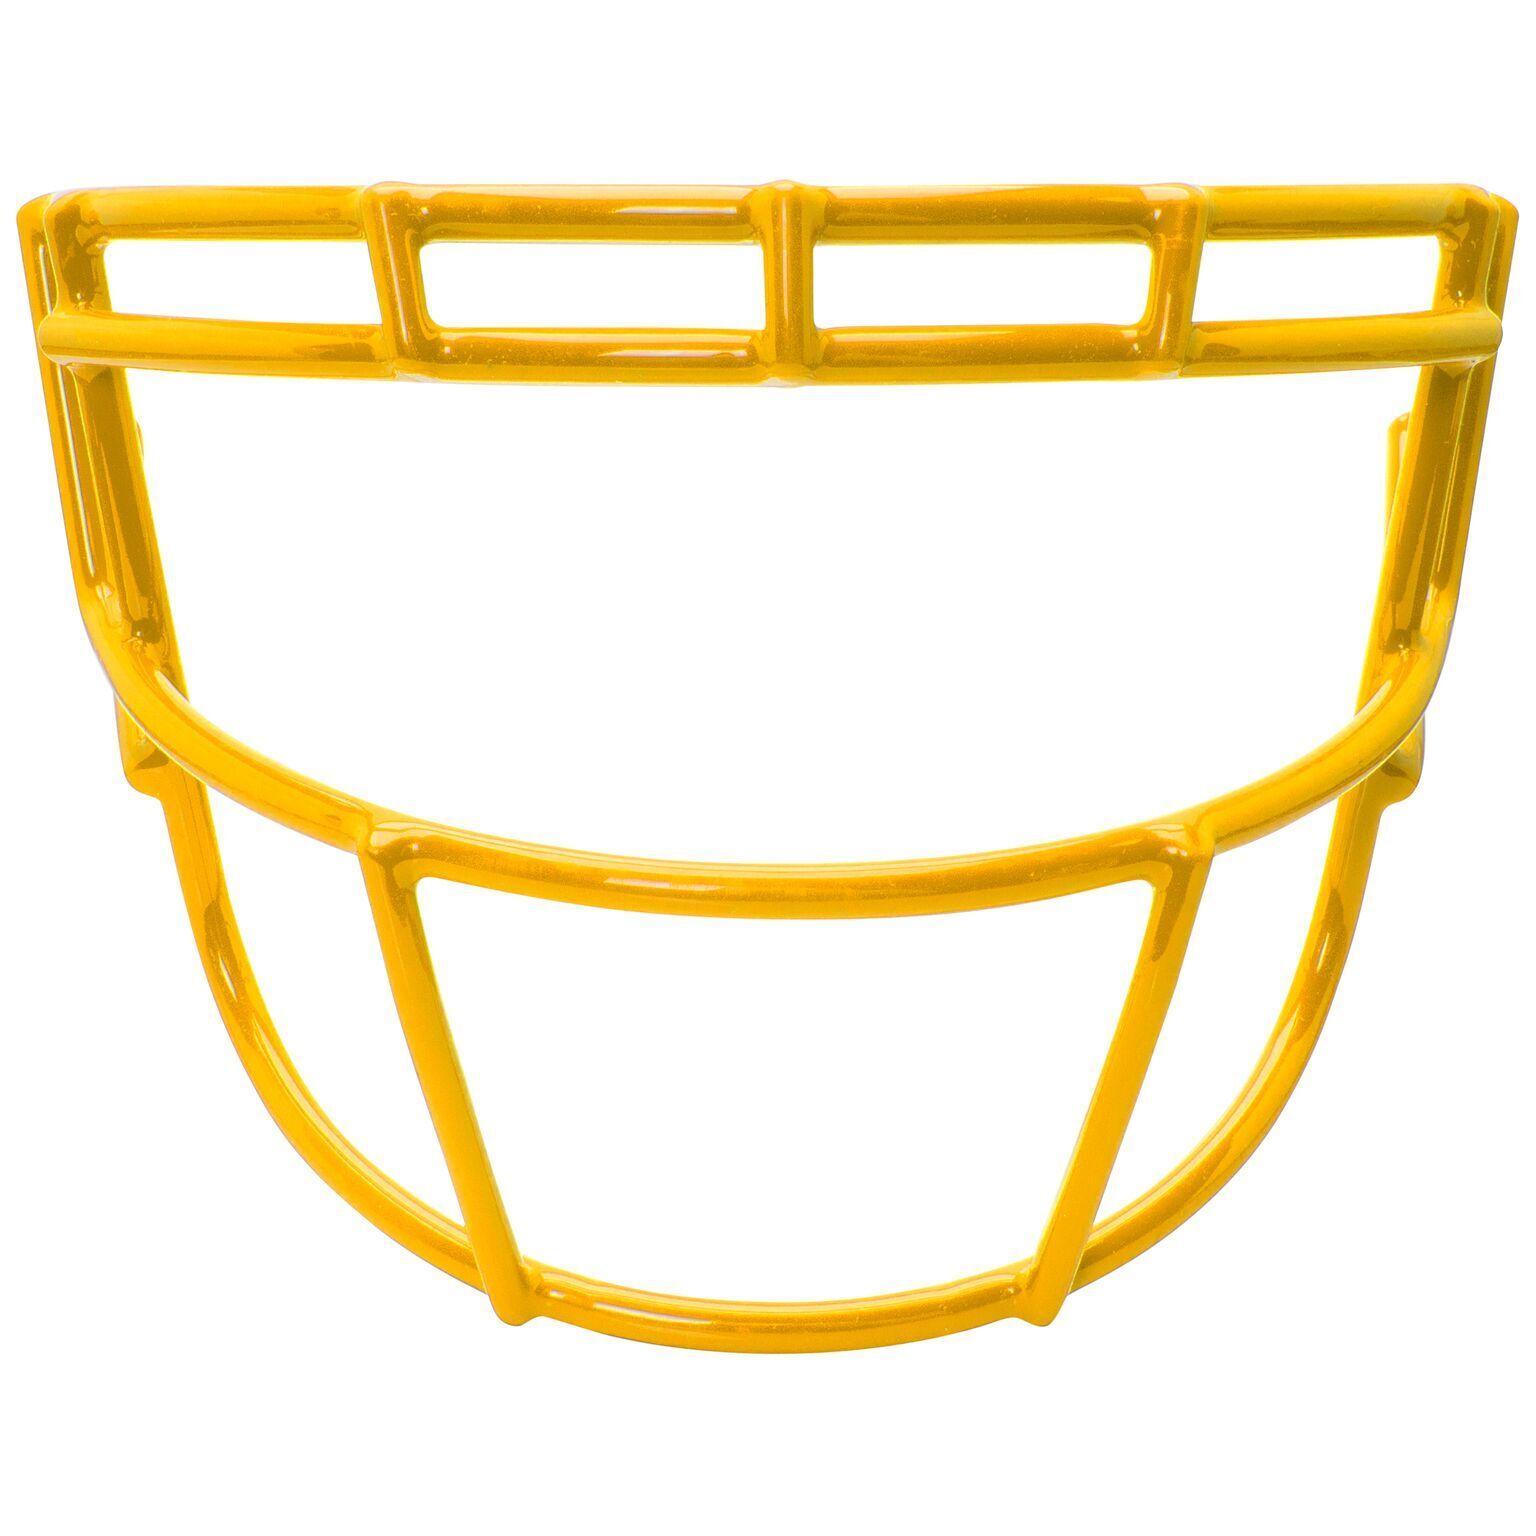 Schutt Vengeance V-ROPO-SW-TRAD-NB Adult Football Helmet Facemask gold YELLOW